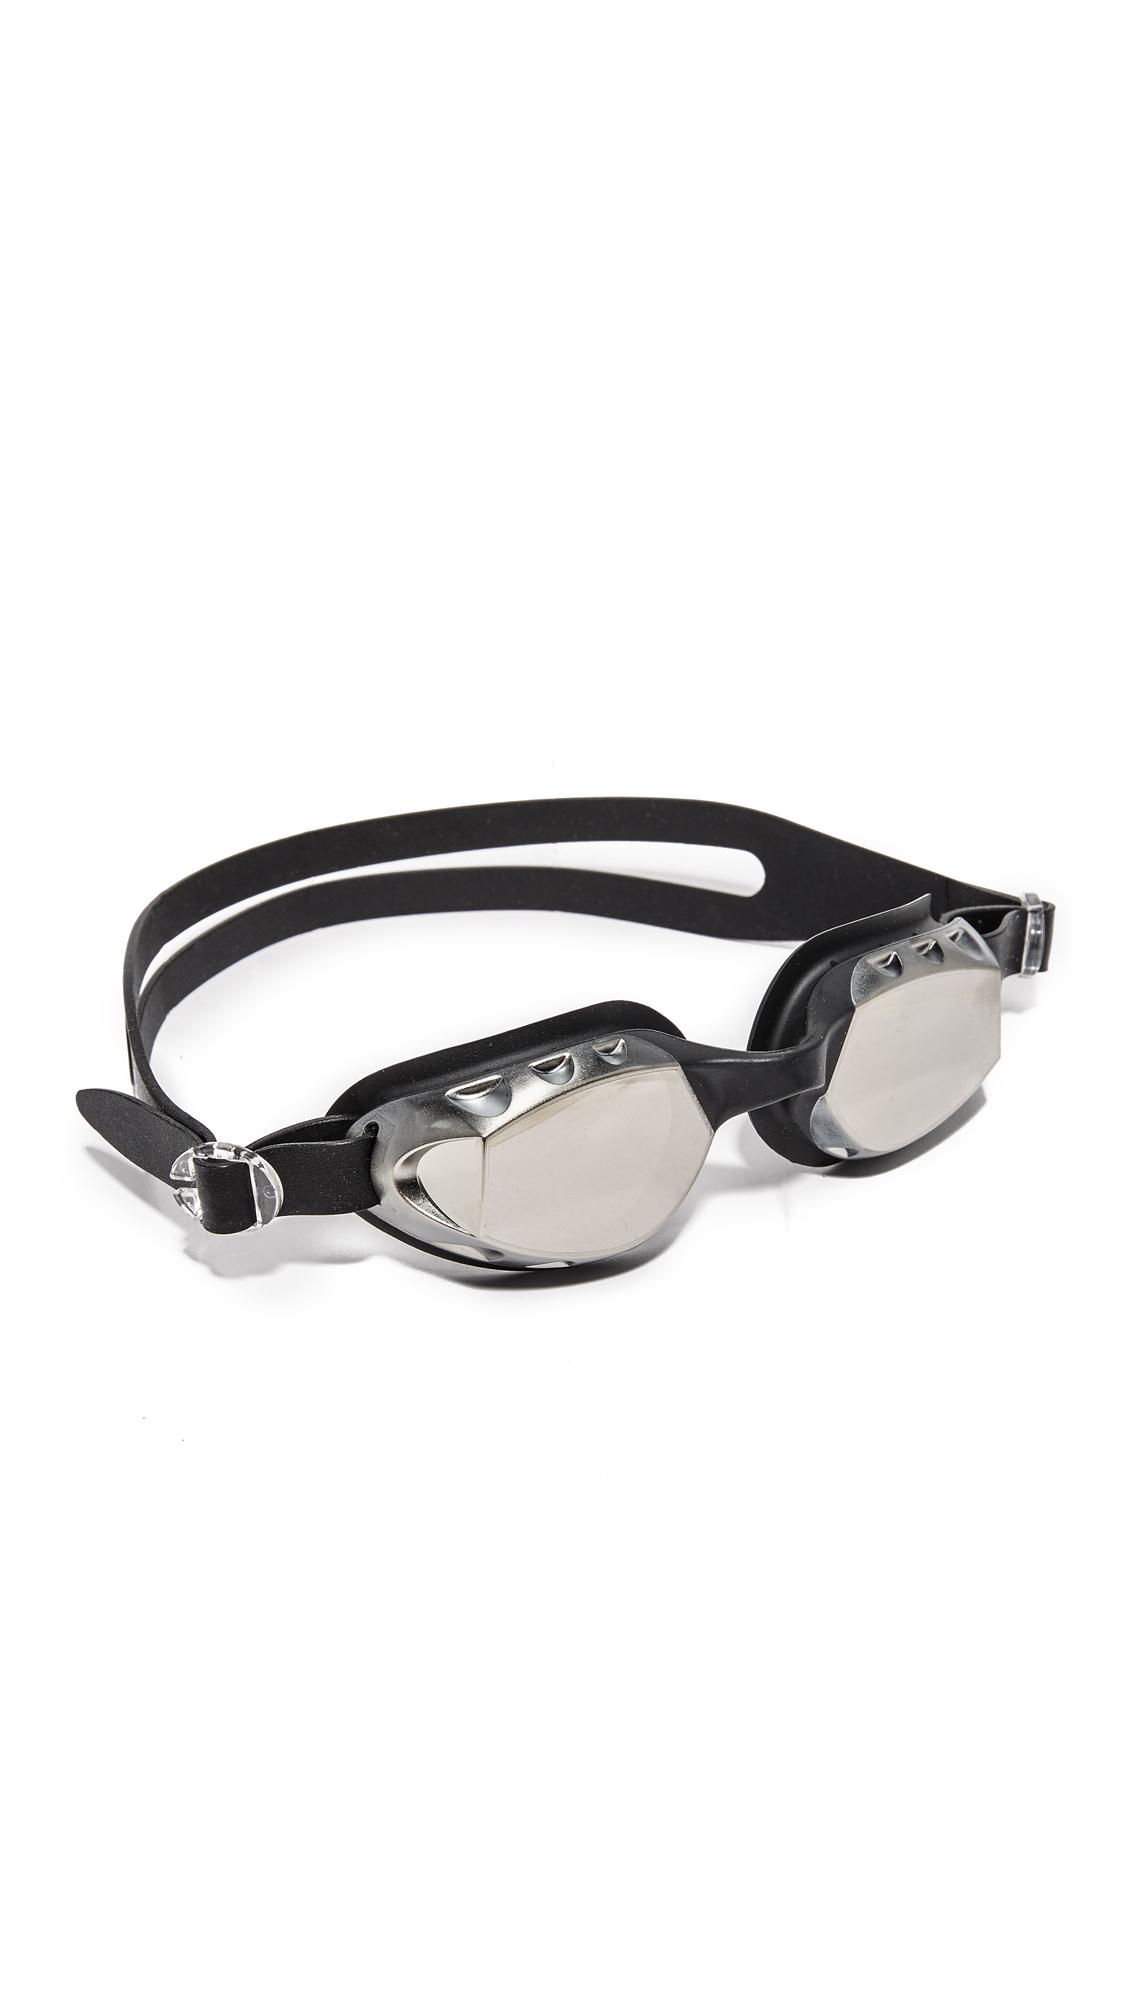 Adidas By Stella Mccartney Swim Goggles - White/Bold Blue at Shopbop